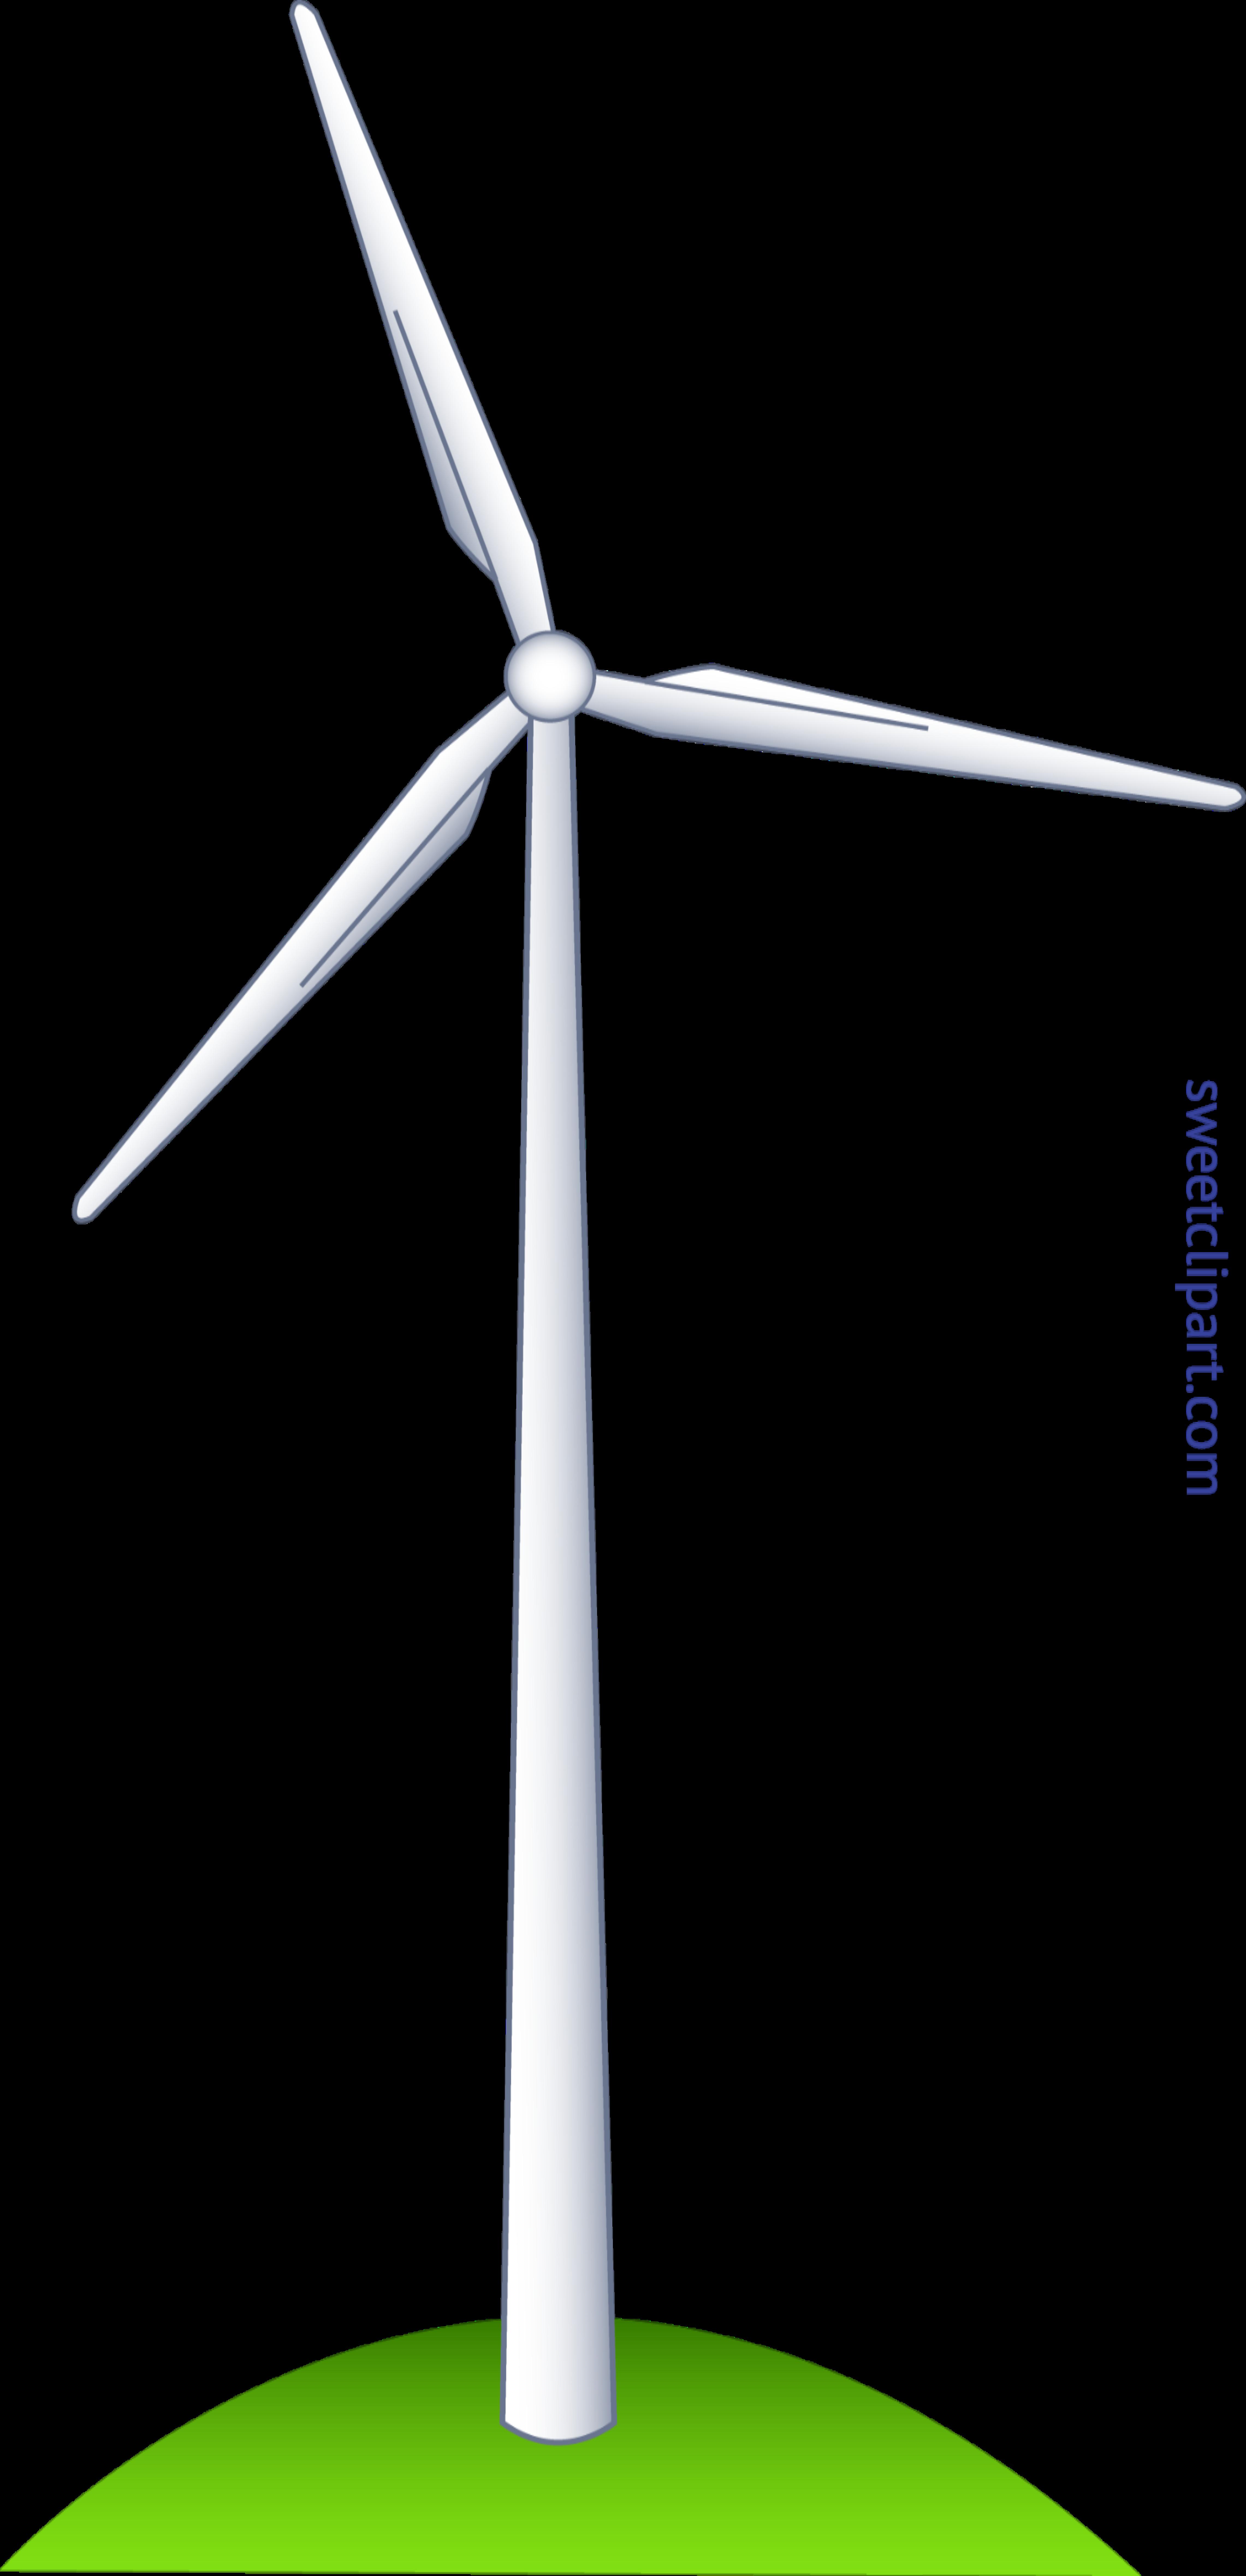 freeuse Clip art sweet. Windmill clipart